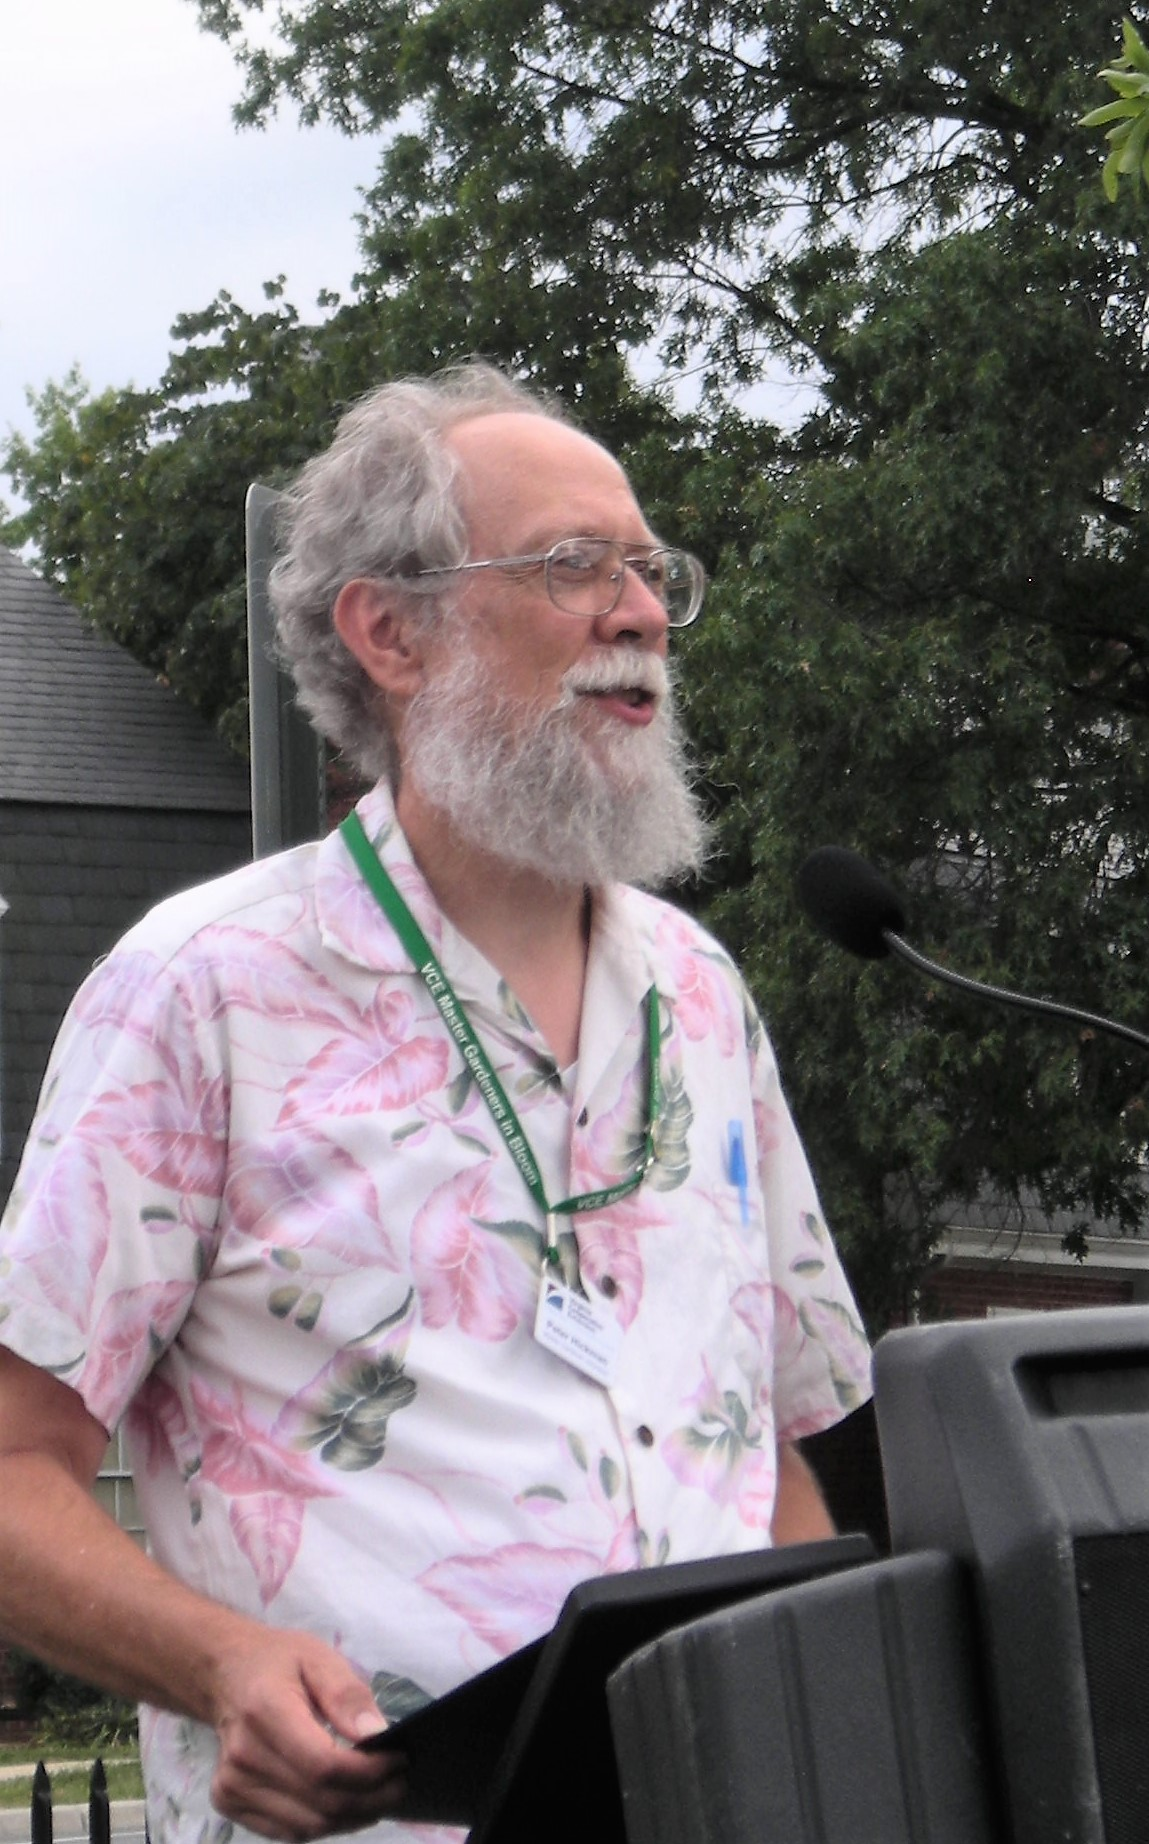 Peter Hickman, MGNV President